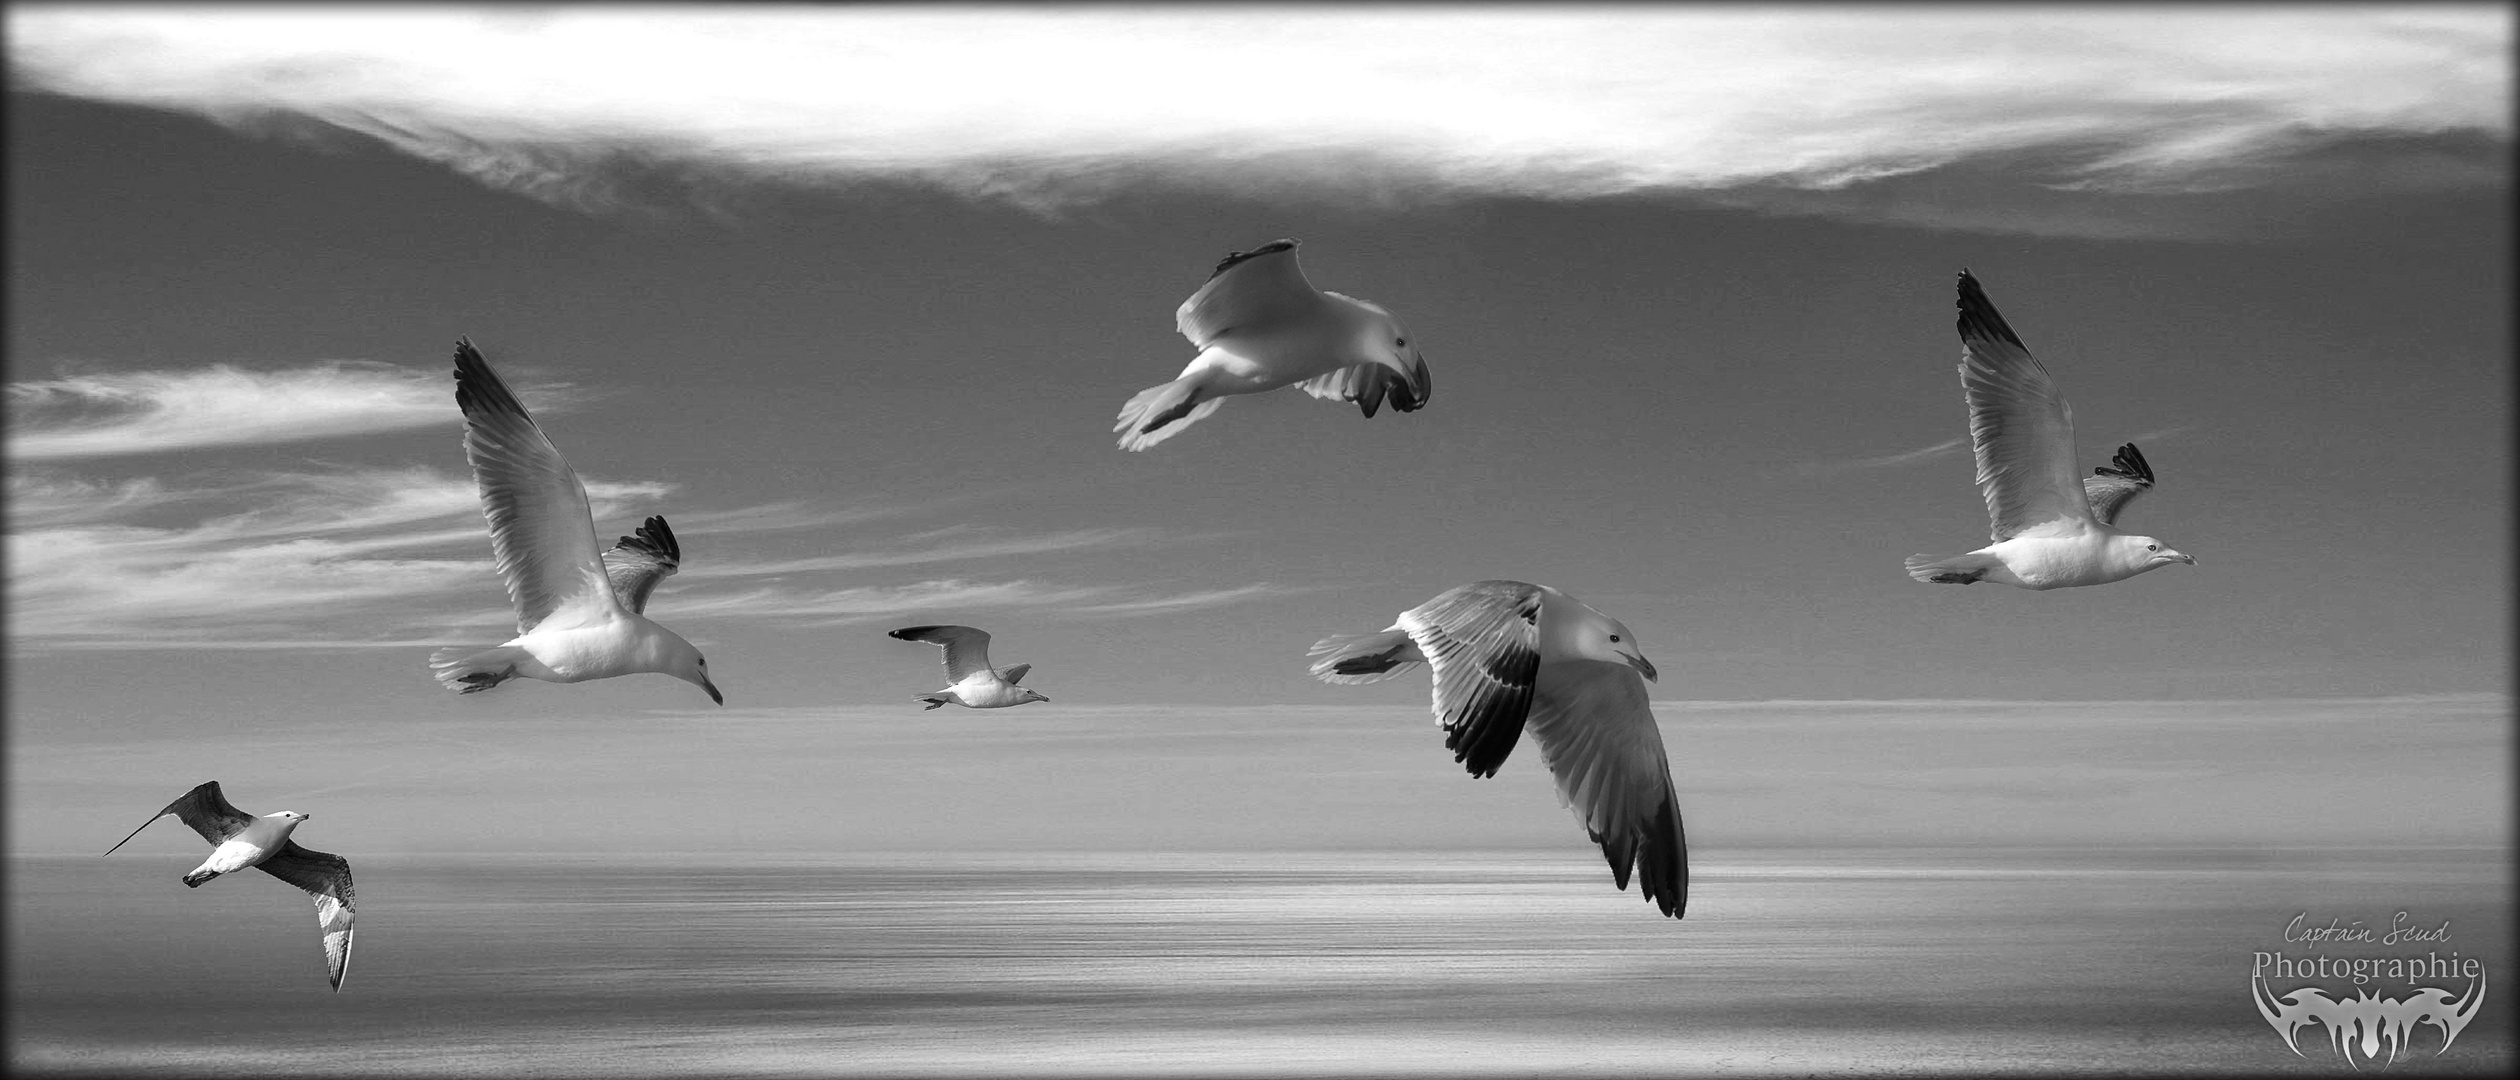 The flight of freedom